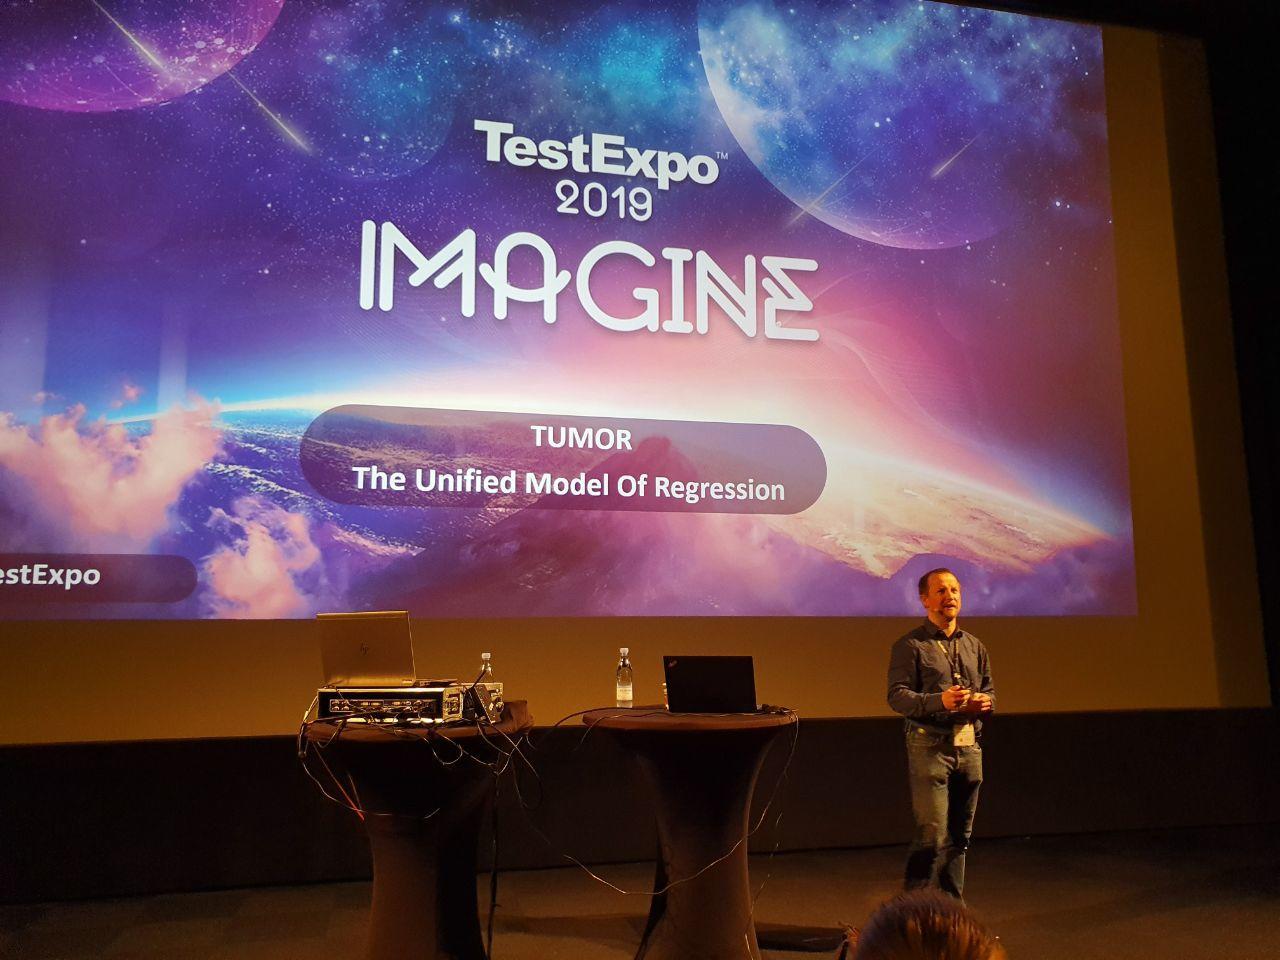 Bartek presenting at Test Expo 2019